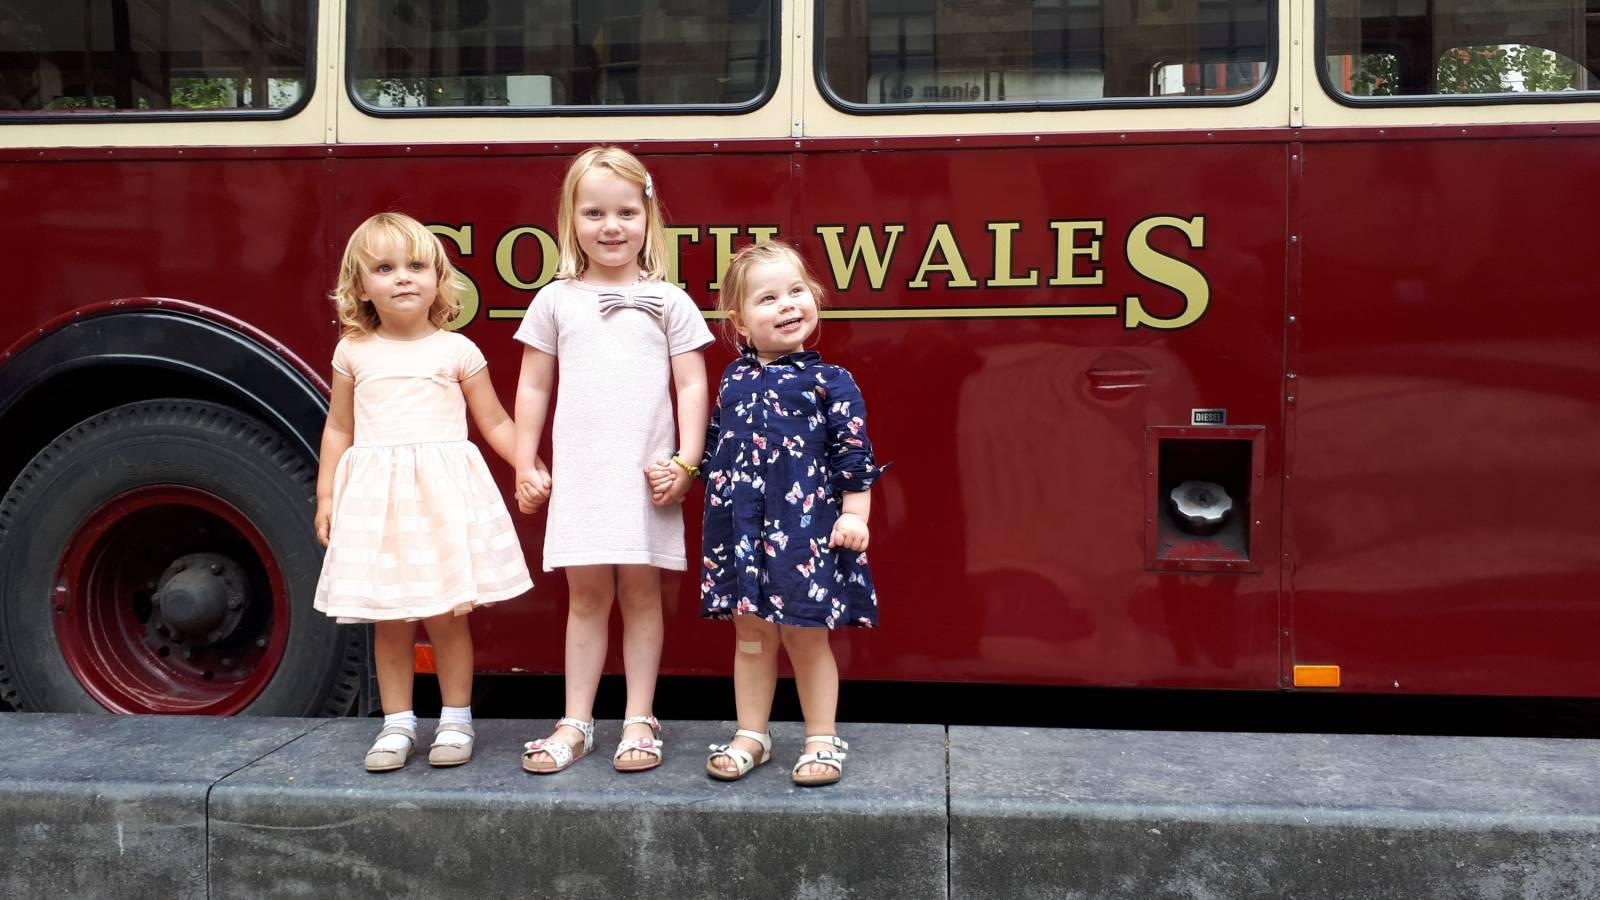 The London Ceremony Bus - Trouwvervoer - Ceremonievervoer - Bus - House of Weddings - 4